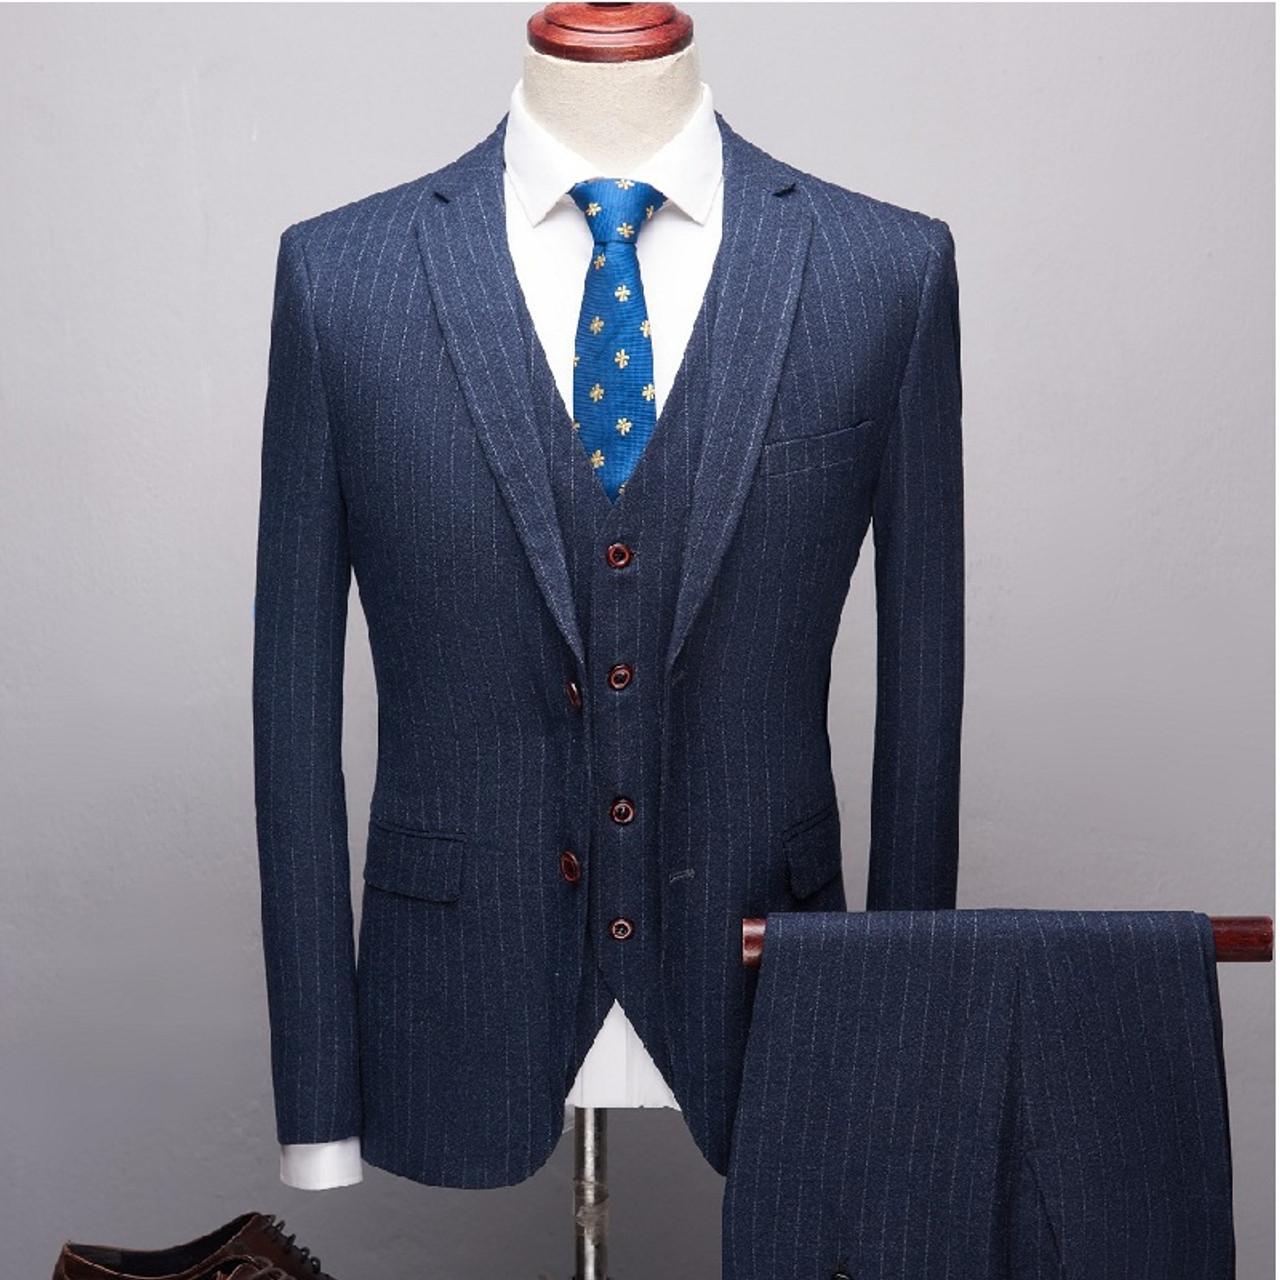 b251a79ceed499 ... Designers 2019 Black Red Tuxedo Men's Suits Formal Grooms Wedding Prom  Blazer Mens 3 Piece Korean ...